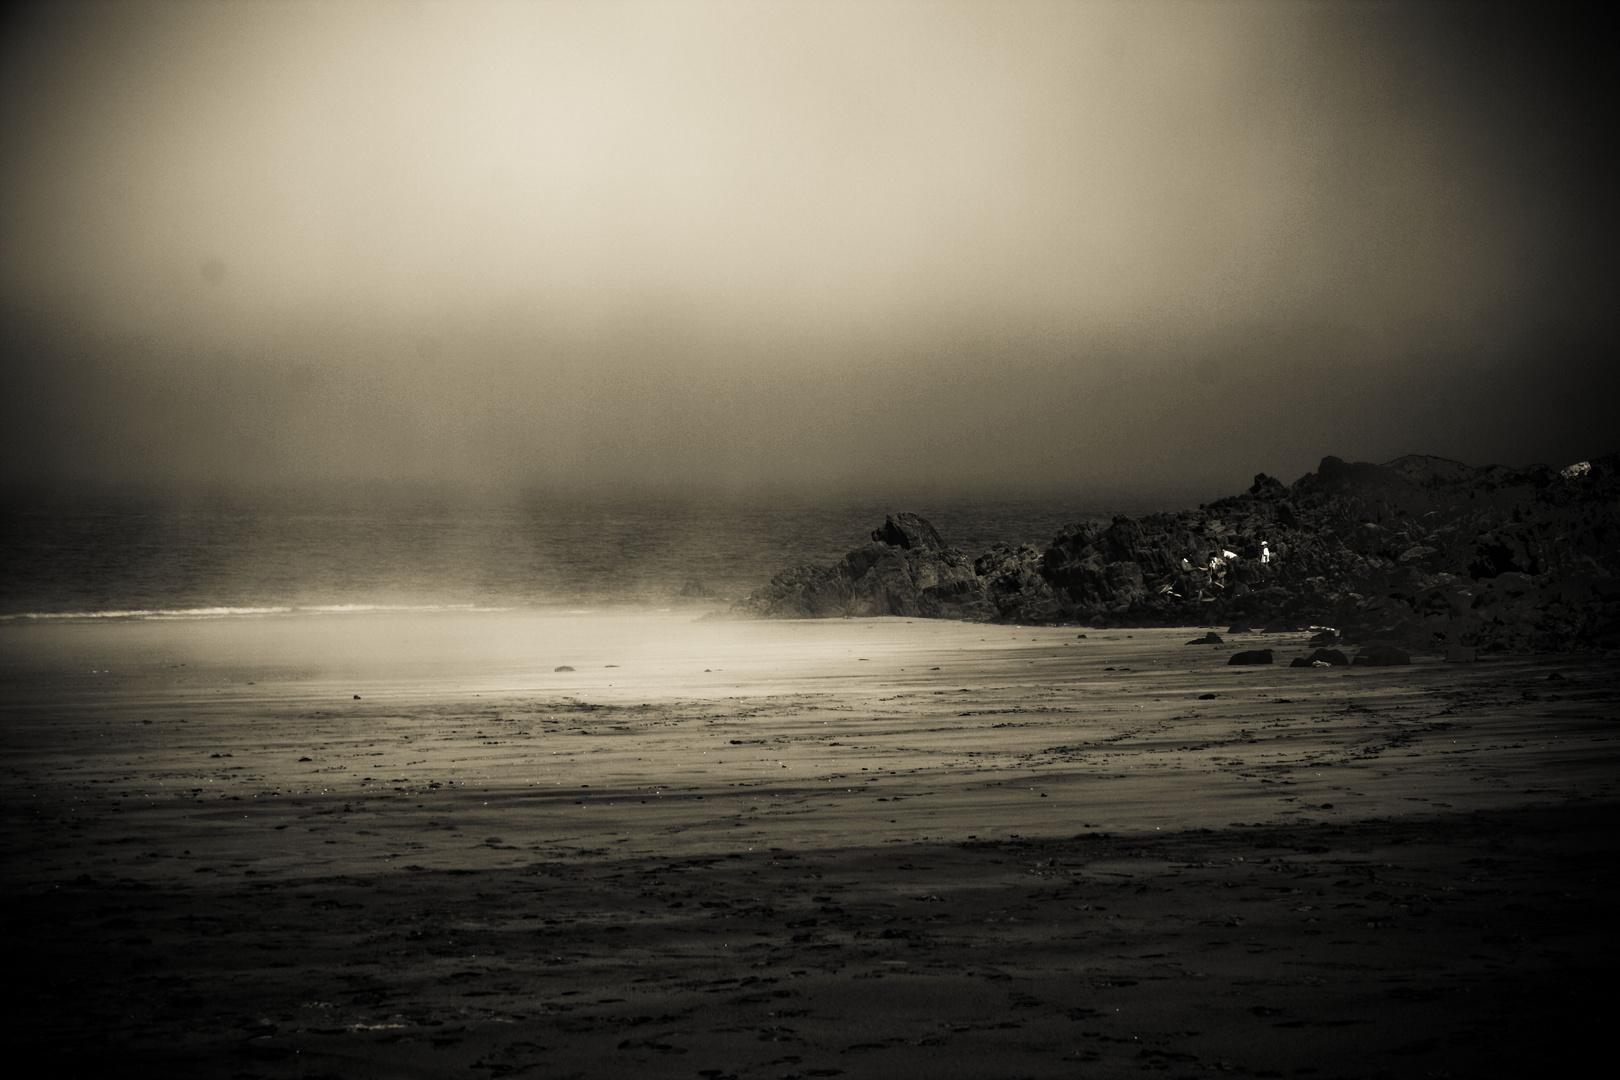 dans la brume...